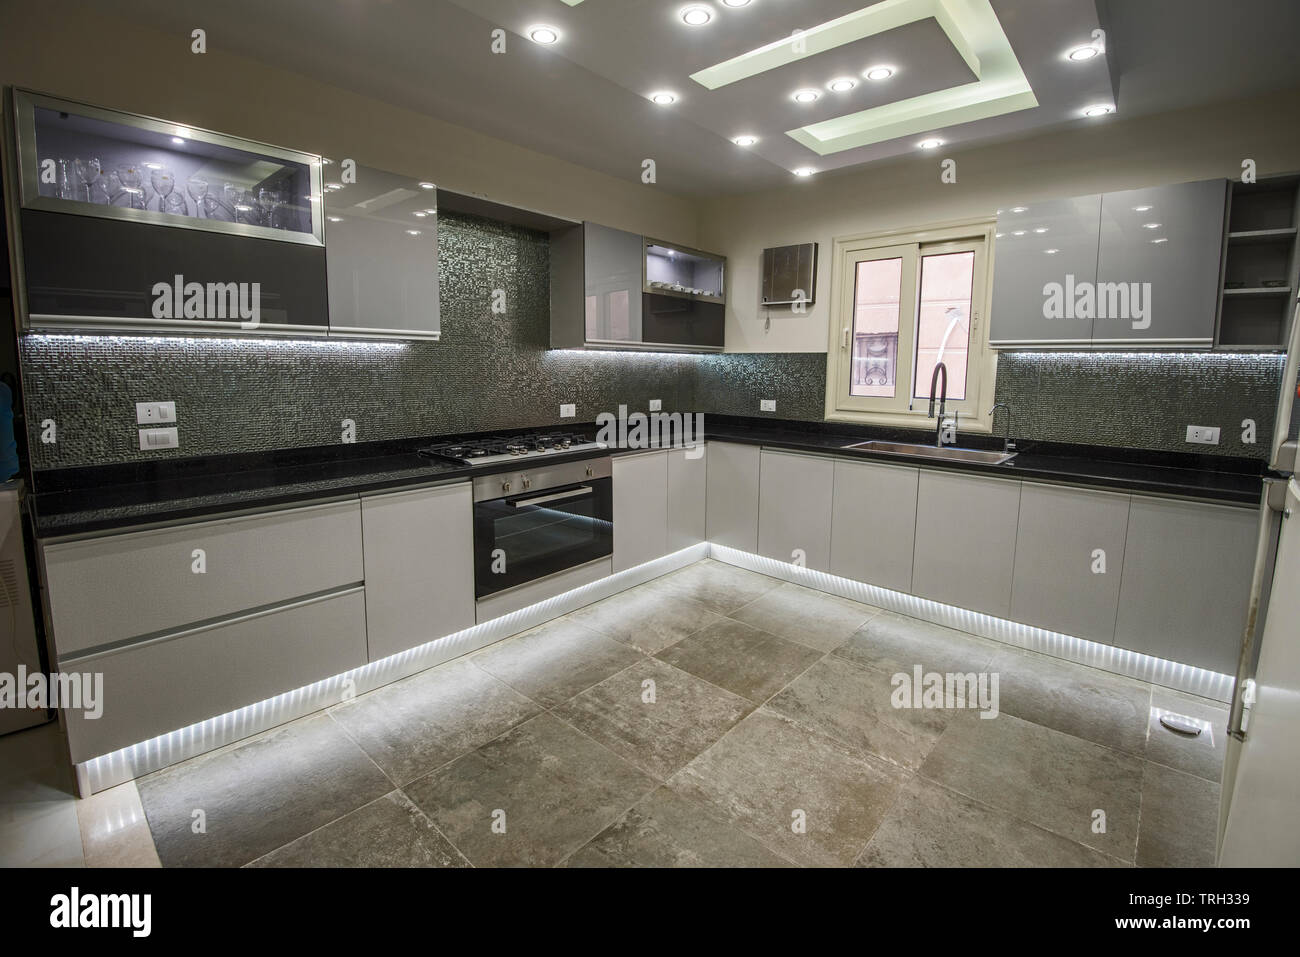 Interior design decor showing modern kitchen and appliances in